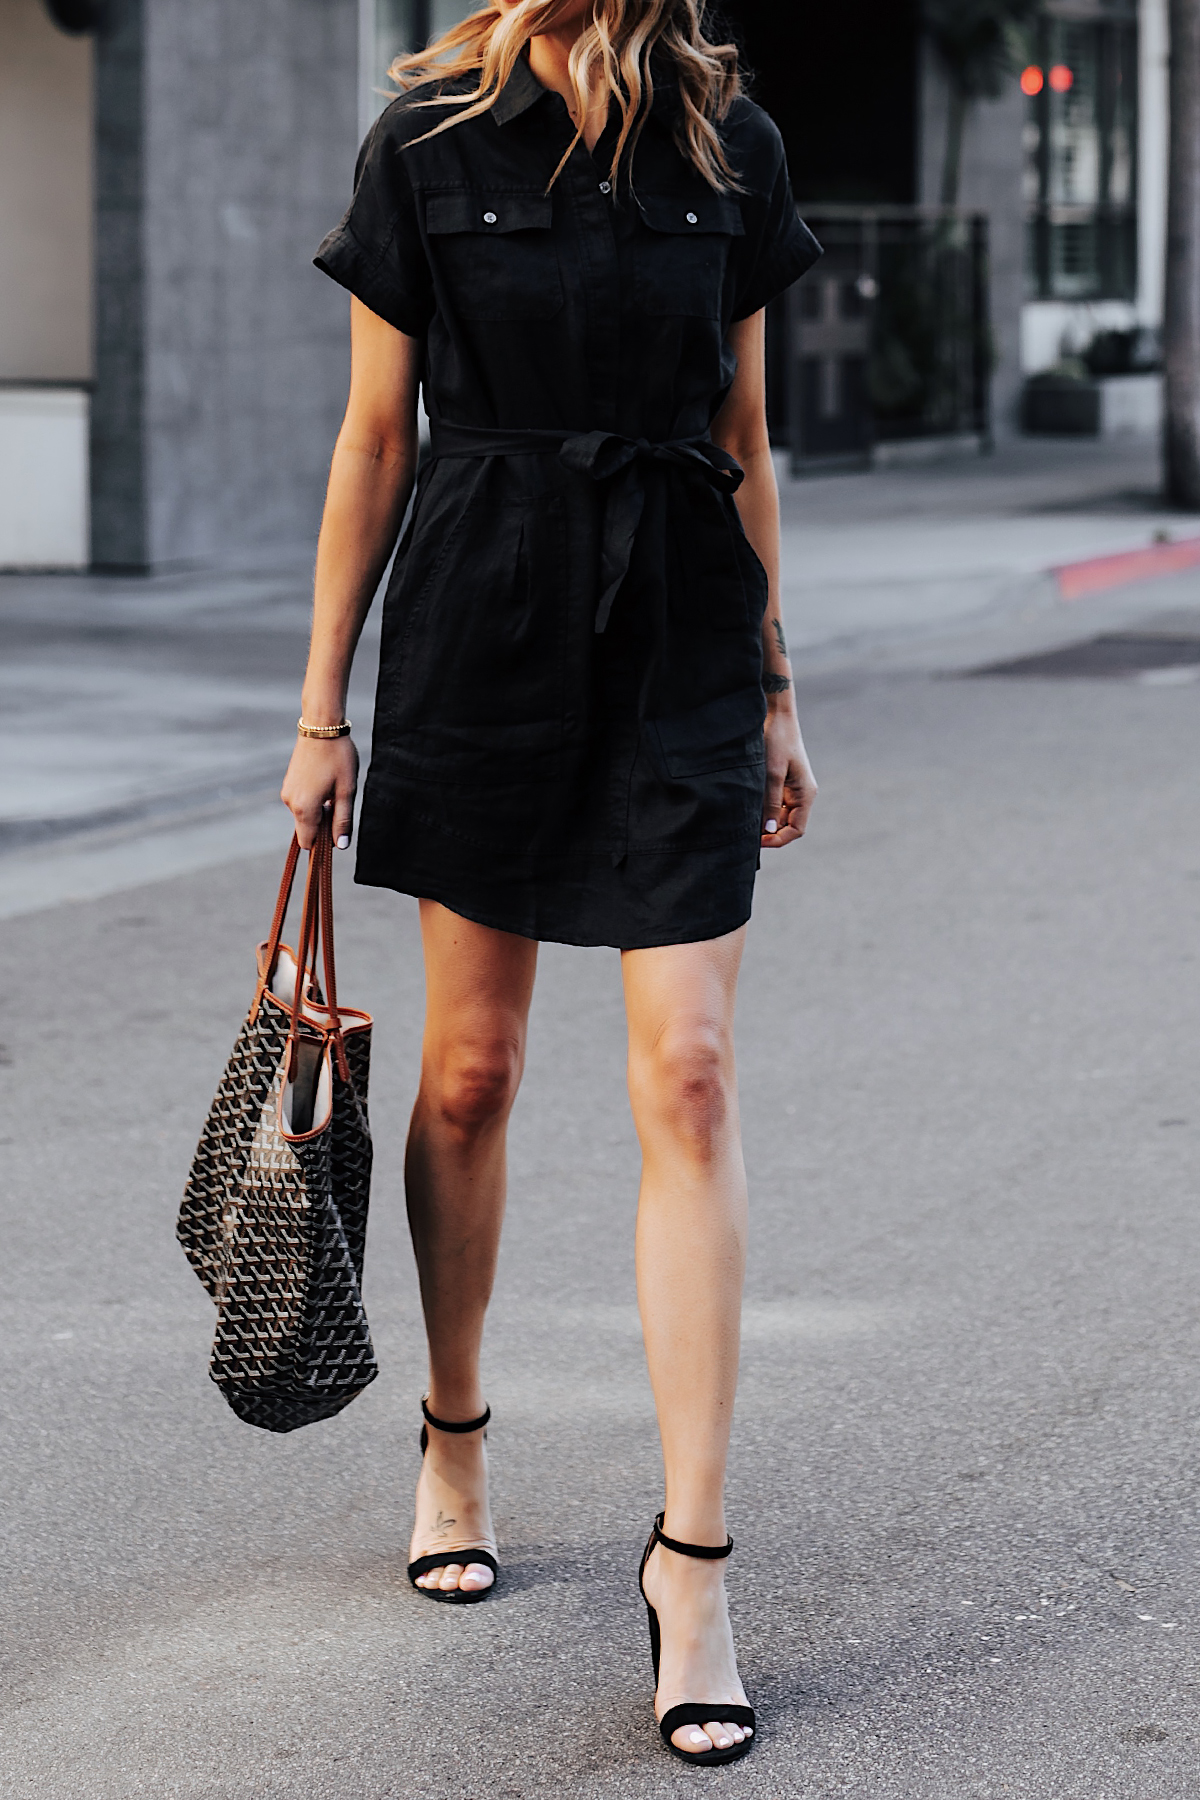 Woman Wearing Black Short Sleeve Shirt Dress Black Heeled Sandals Goyard Tote Fashion Jackson San Diego Fashion Blogger Street Style